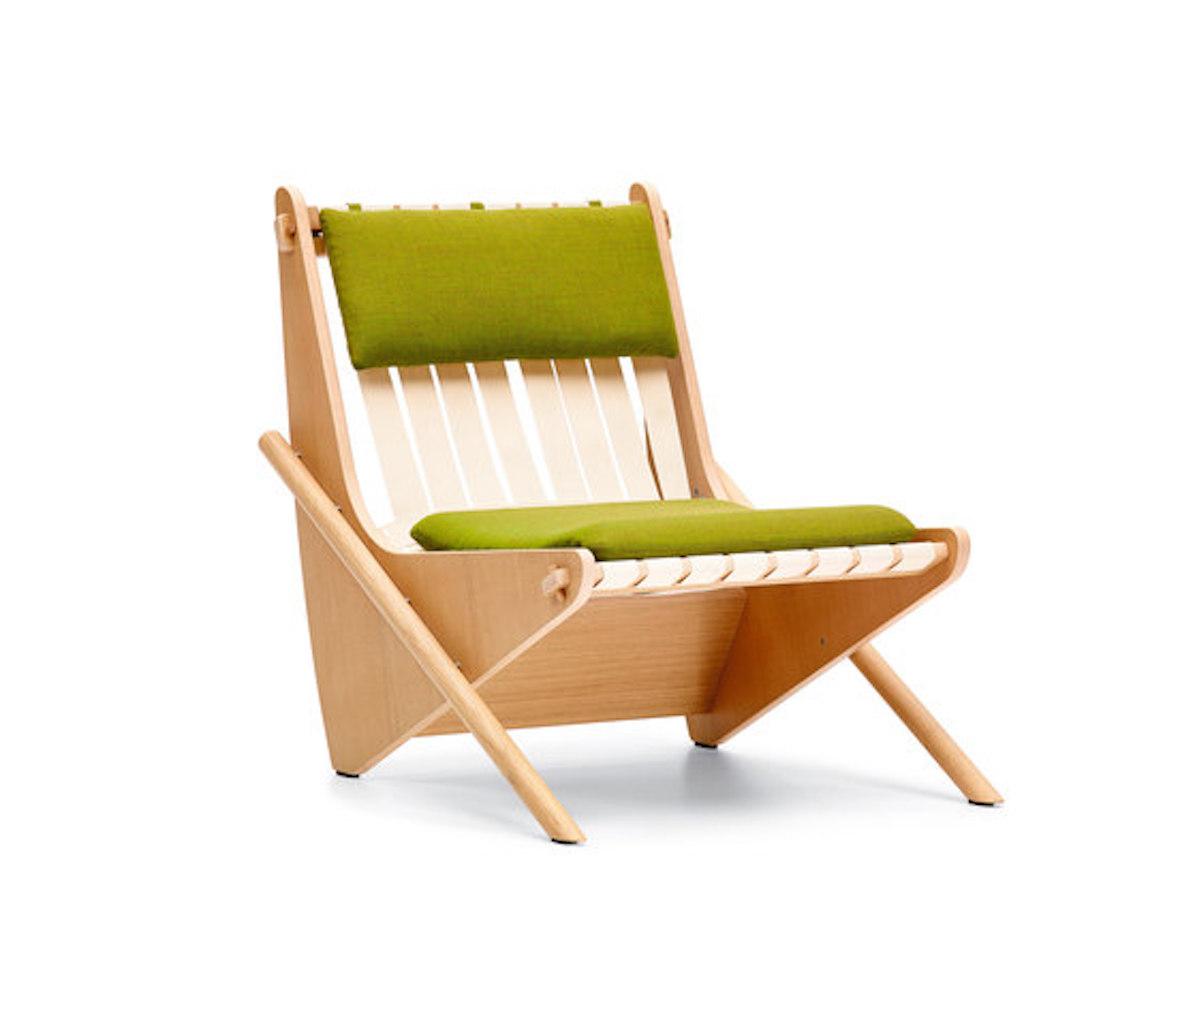 Richard_Neutra_VS_boomerang_Chair_1